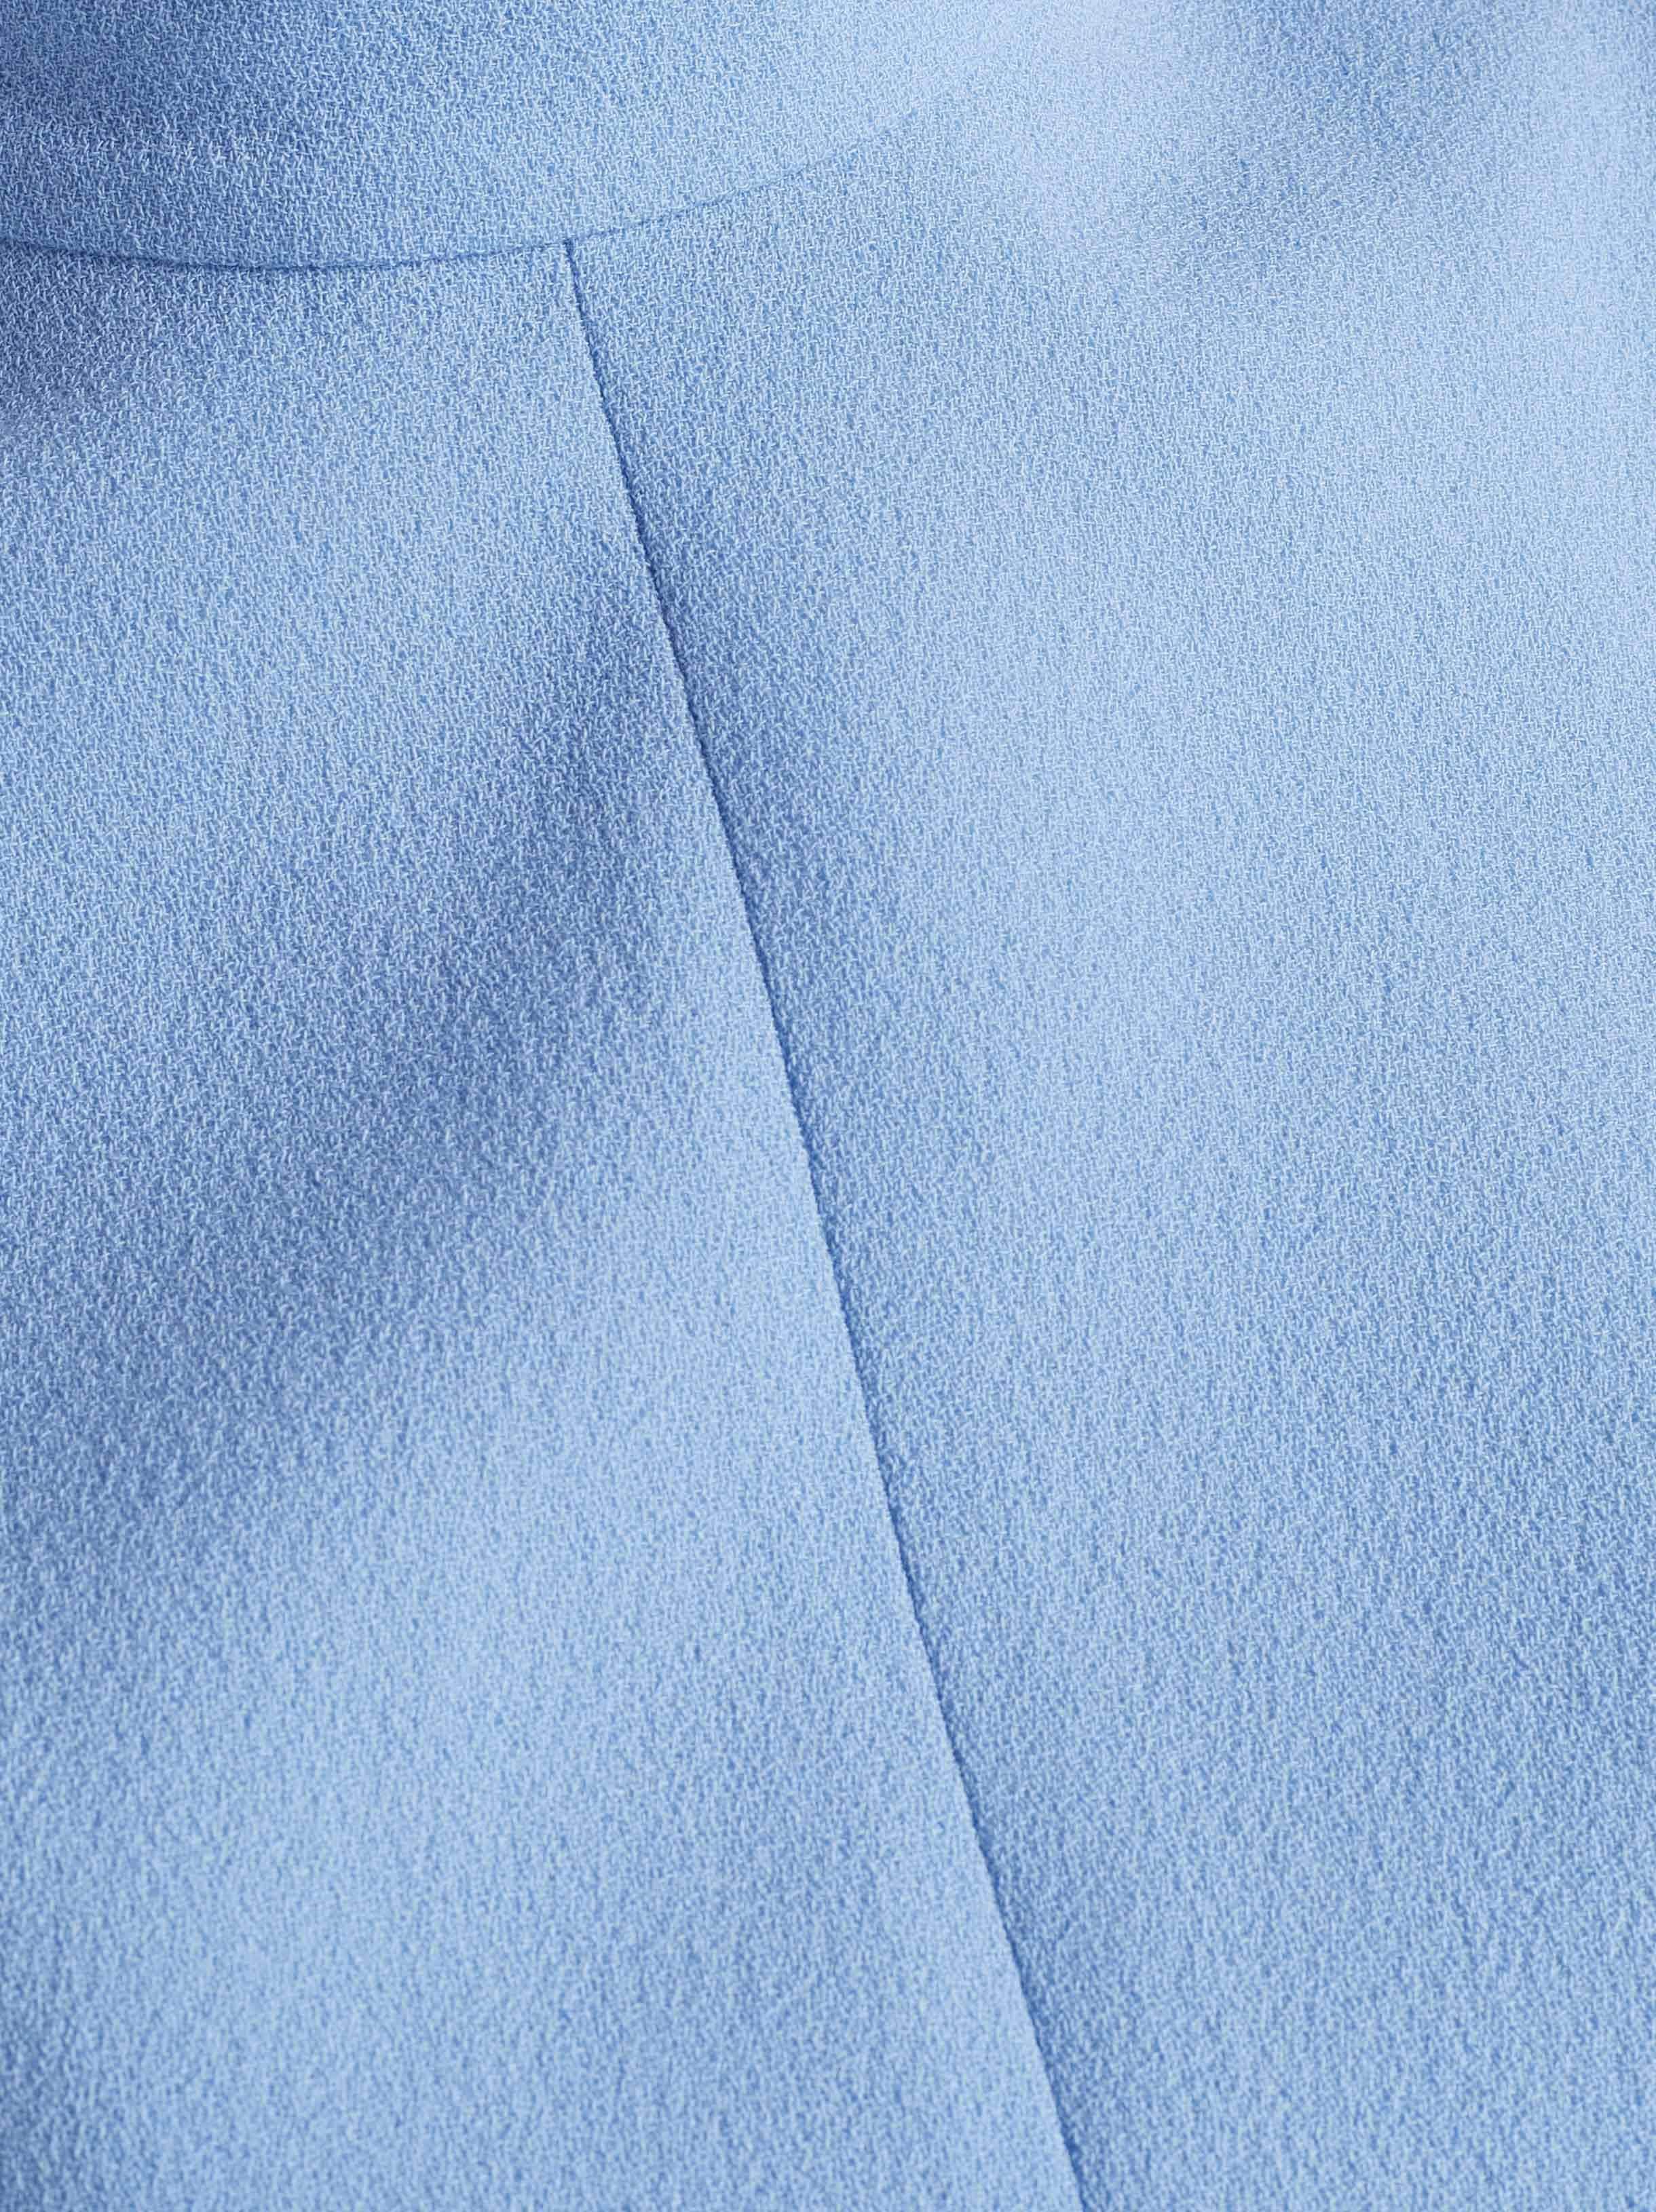 0a70dbcb39 Emilia Wickstead Elvis Belted Wool-crepe Jumpsuit in Blue - Lyst